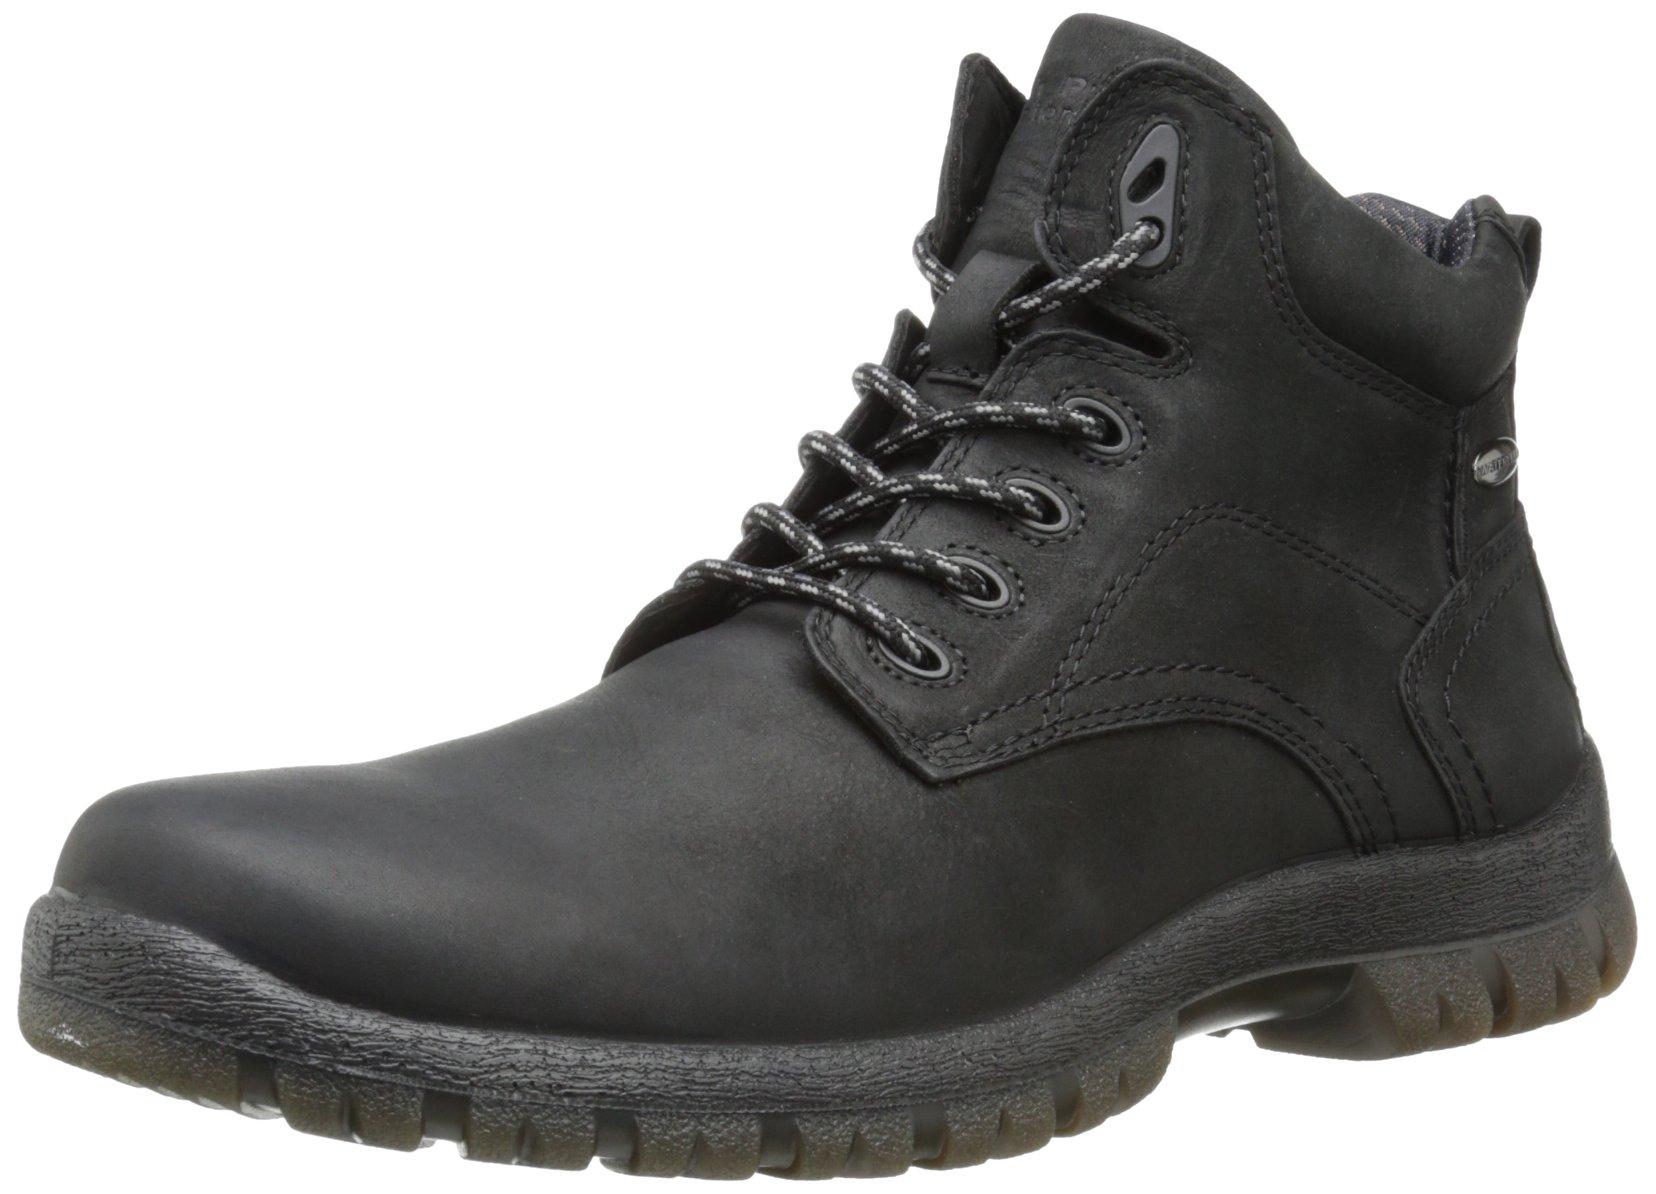 Hush Puppies Men's Outclass Boot